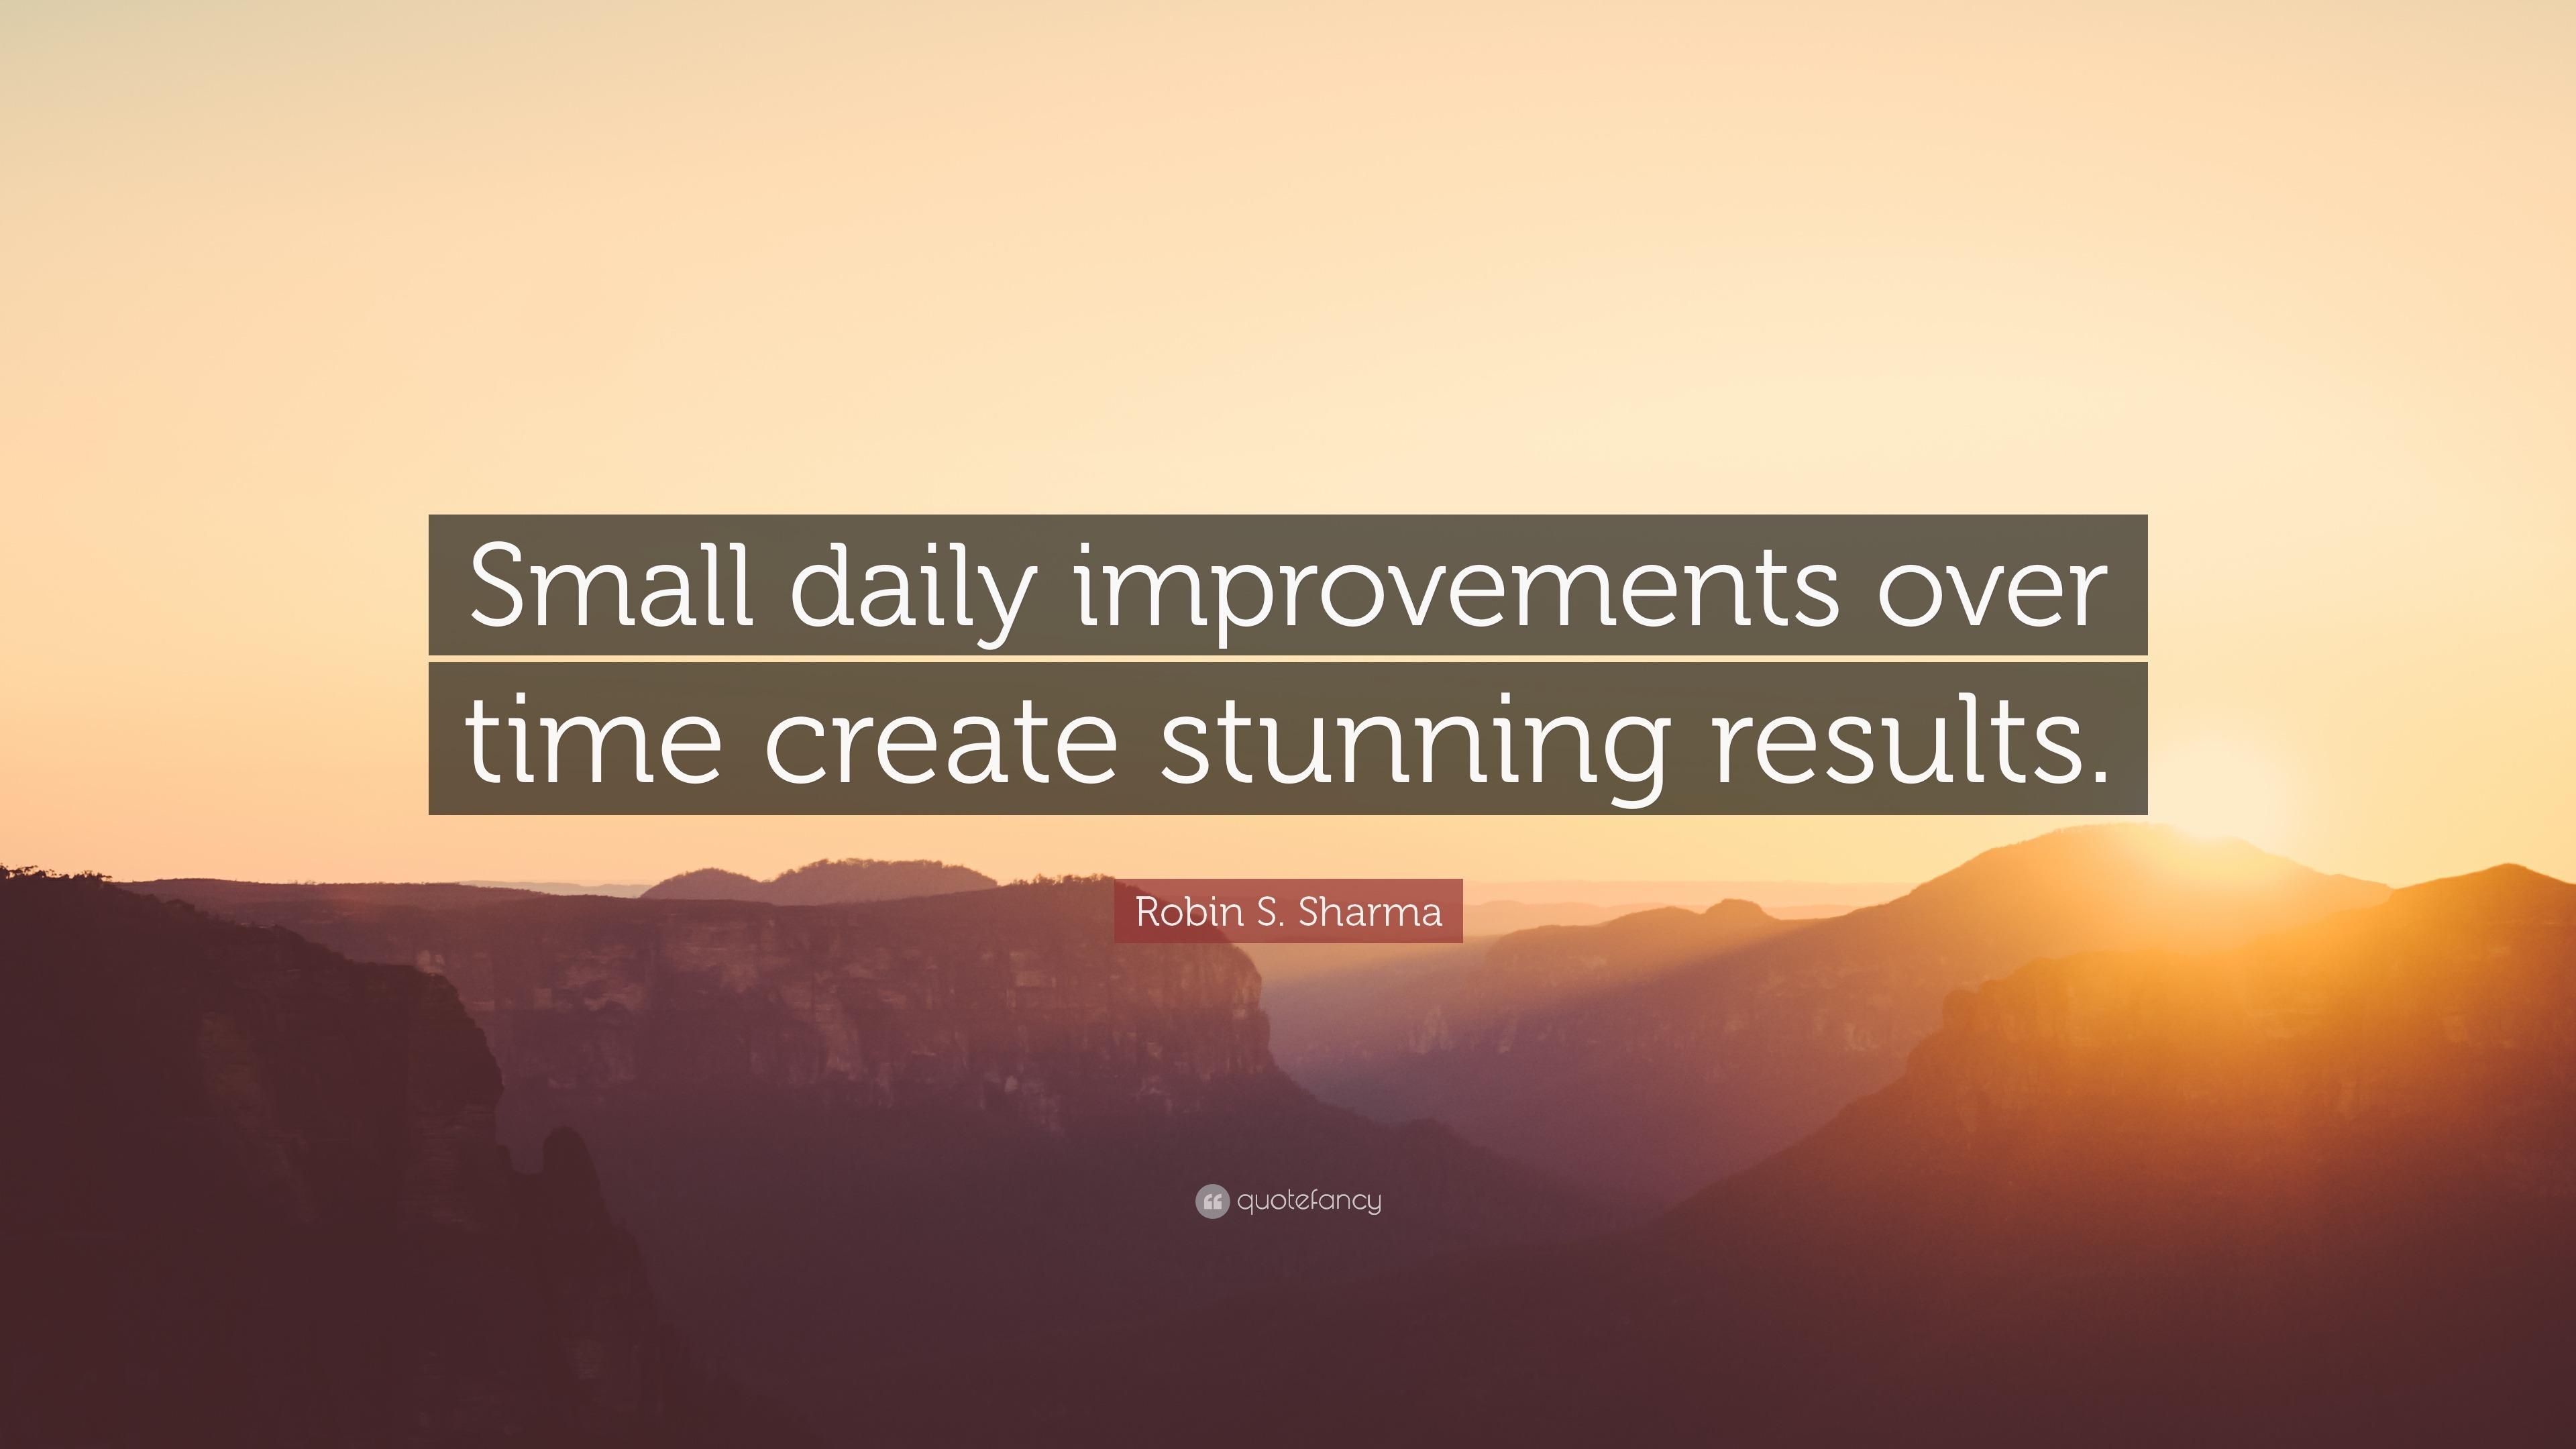 Swami Vivekananda Quotes Wallpaper Robin S Sharma Quote Small Daily Improvements Over Time